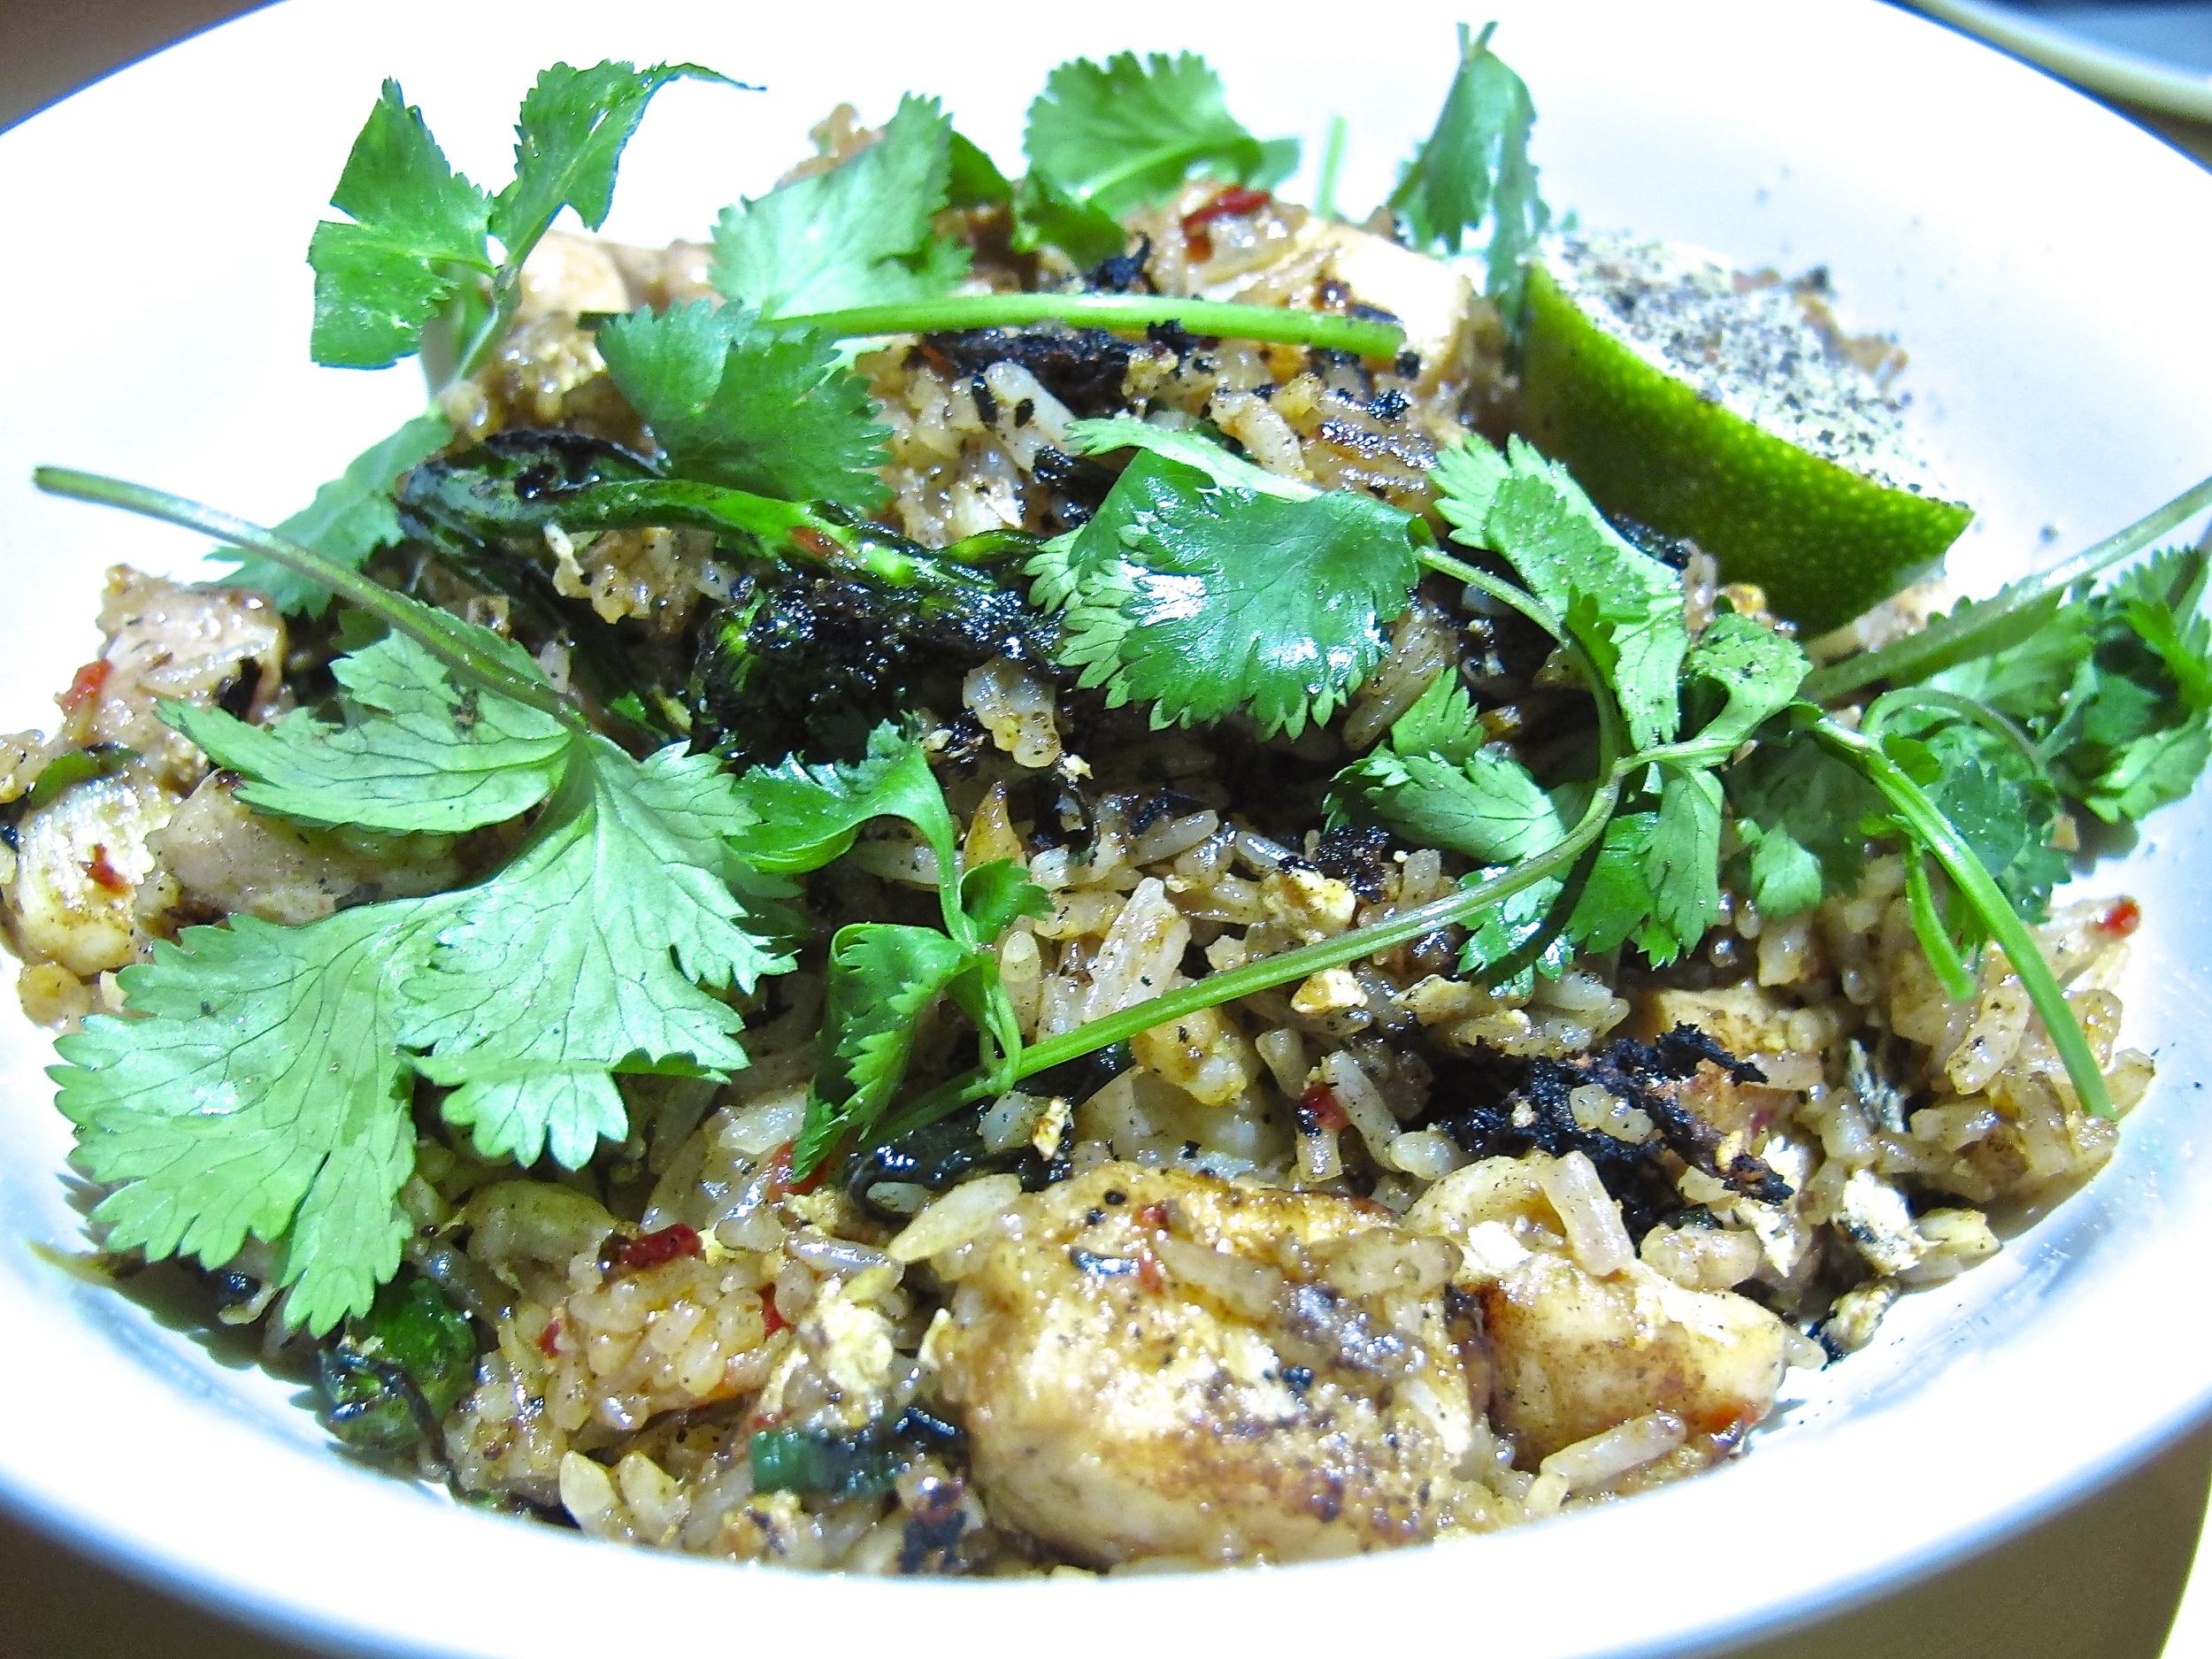 East Borough's fried rice